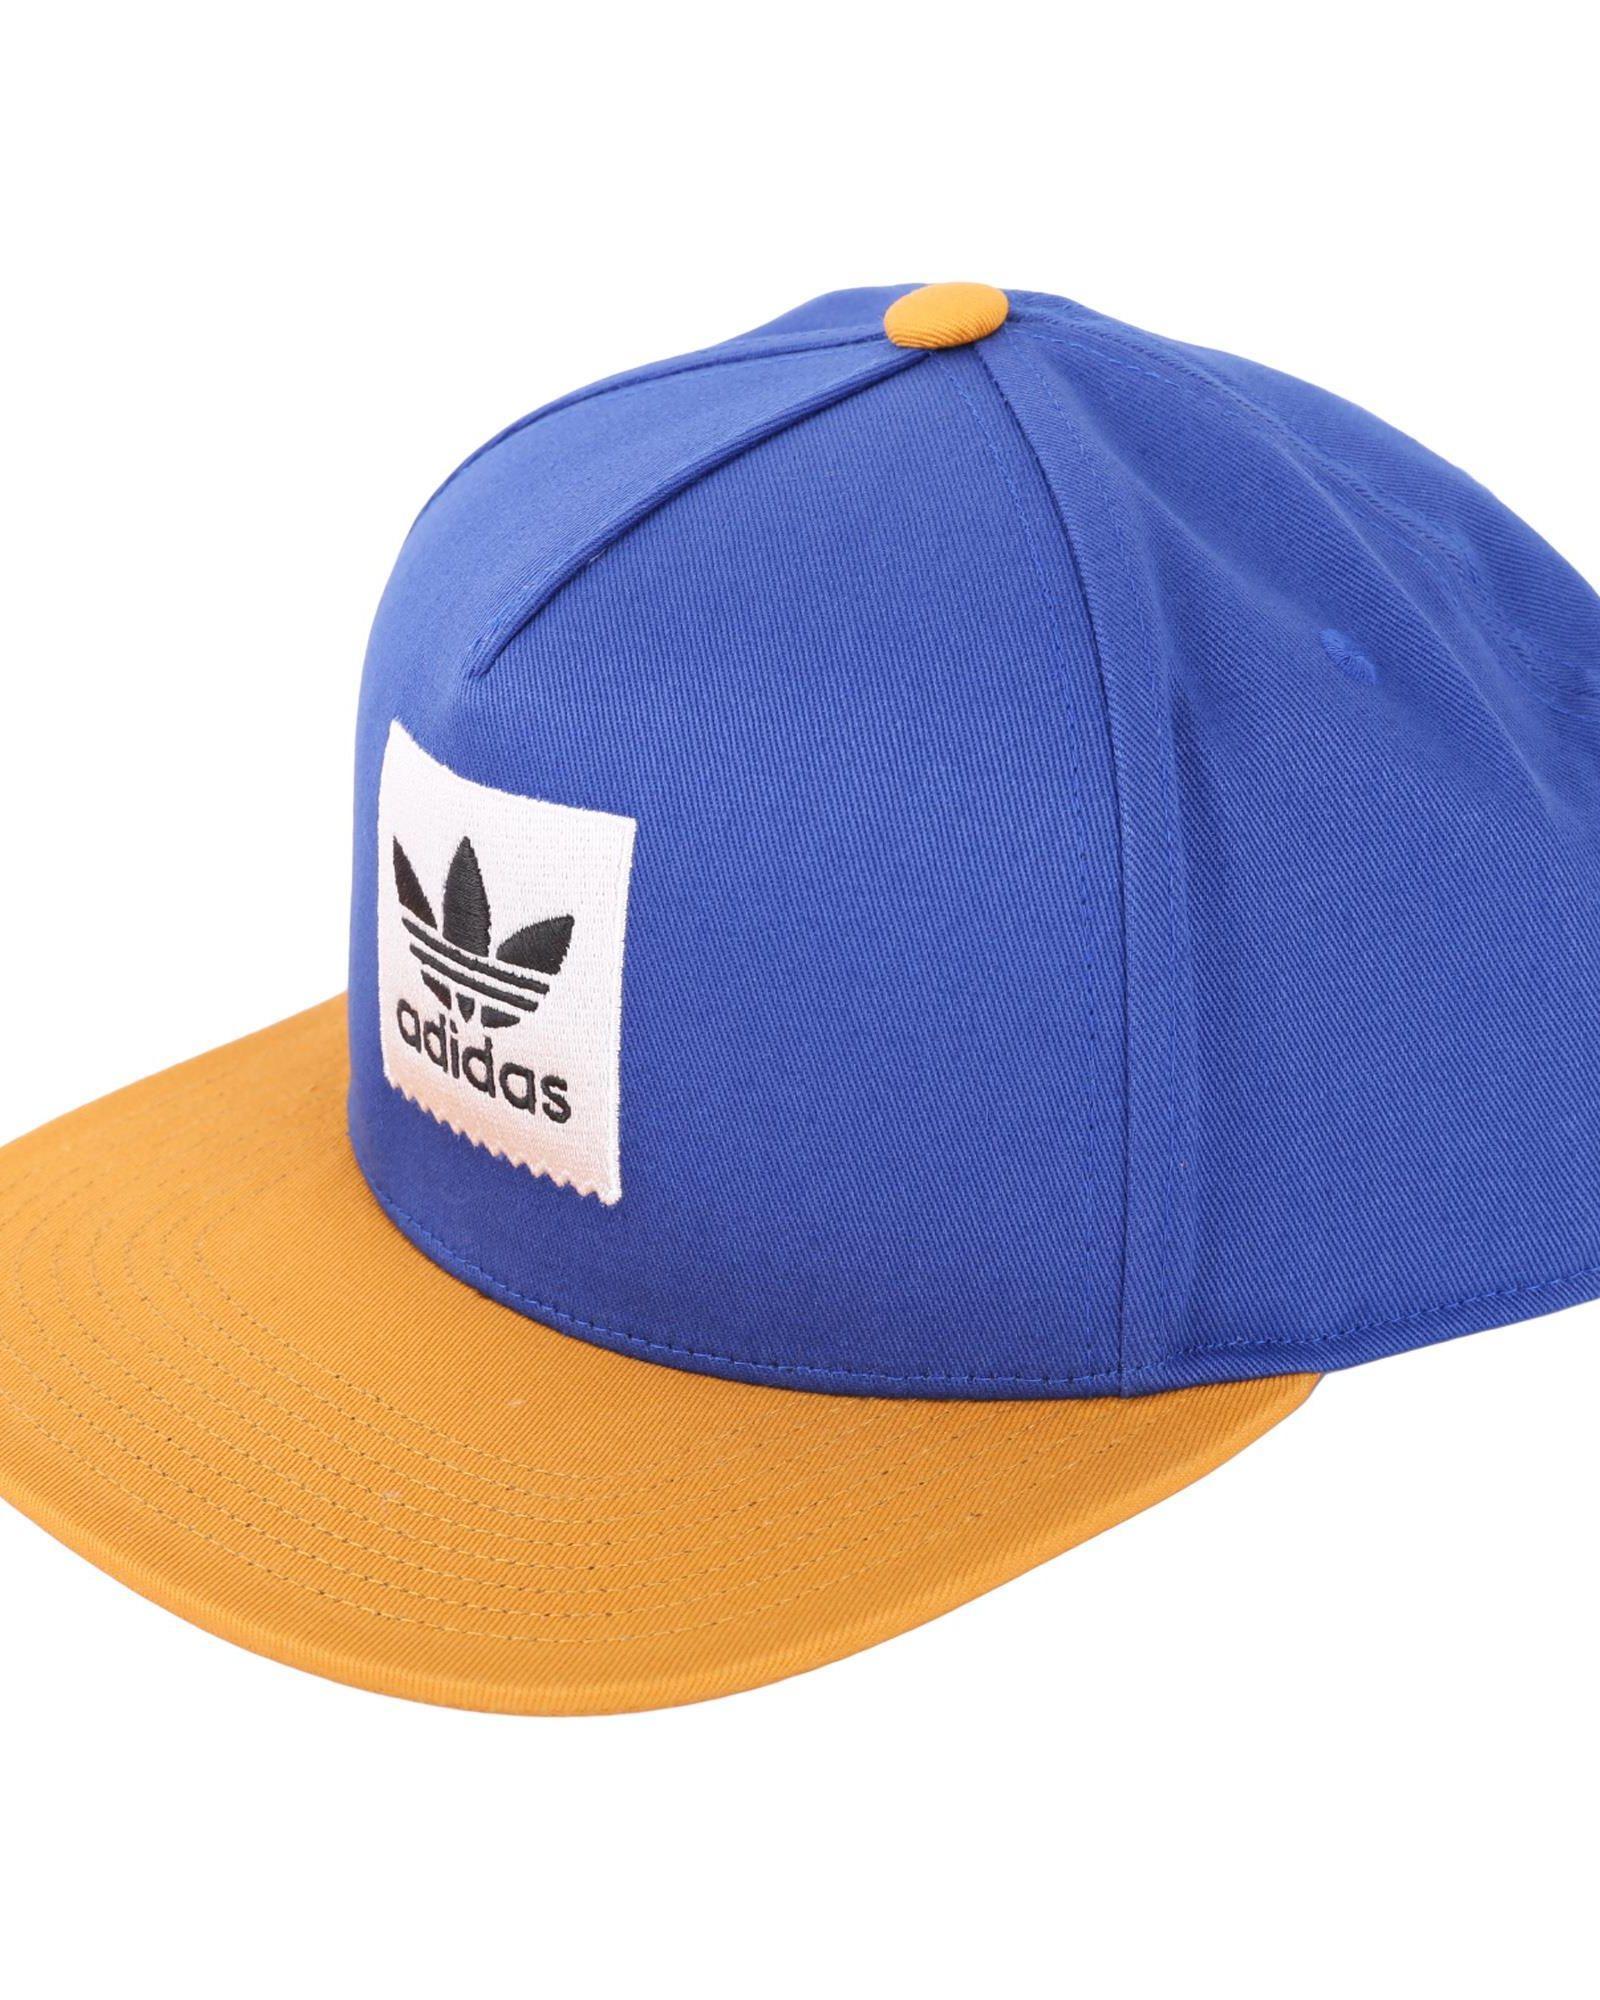 017bb089afd45 Adidas Originals 2Tone Snapback Hat In Blue - Yellow